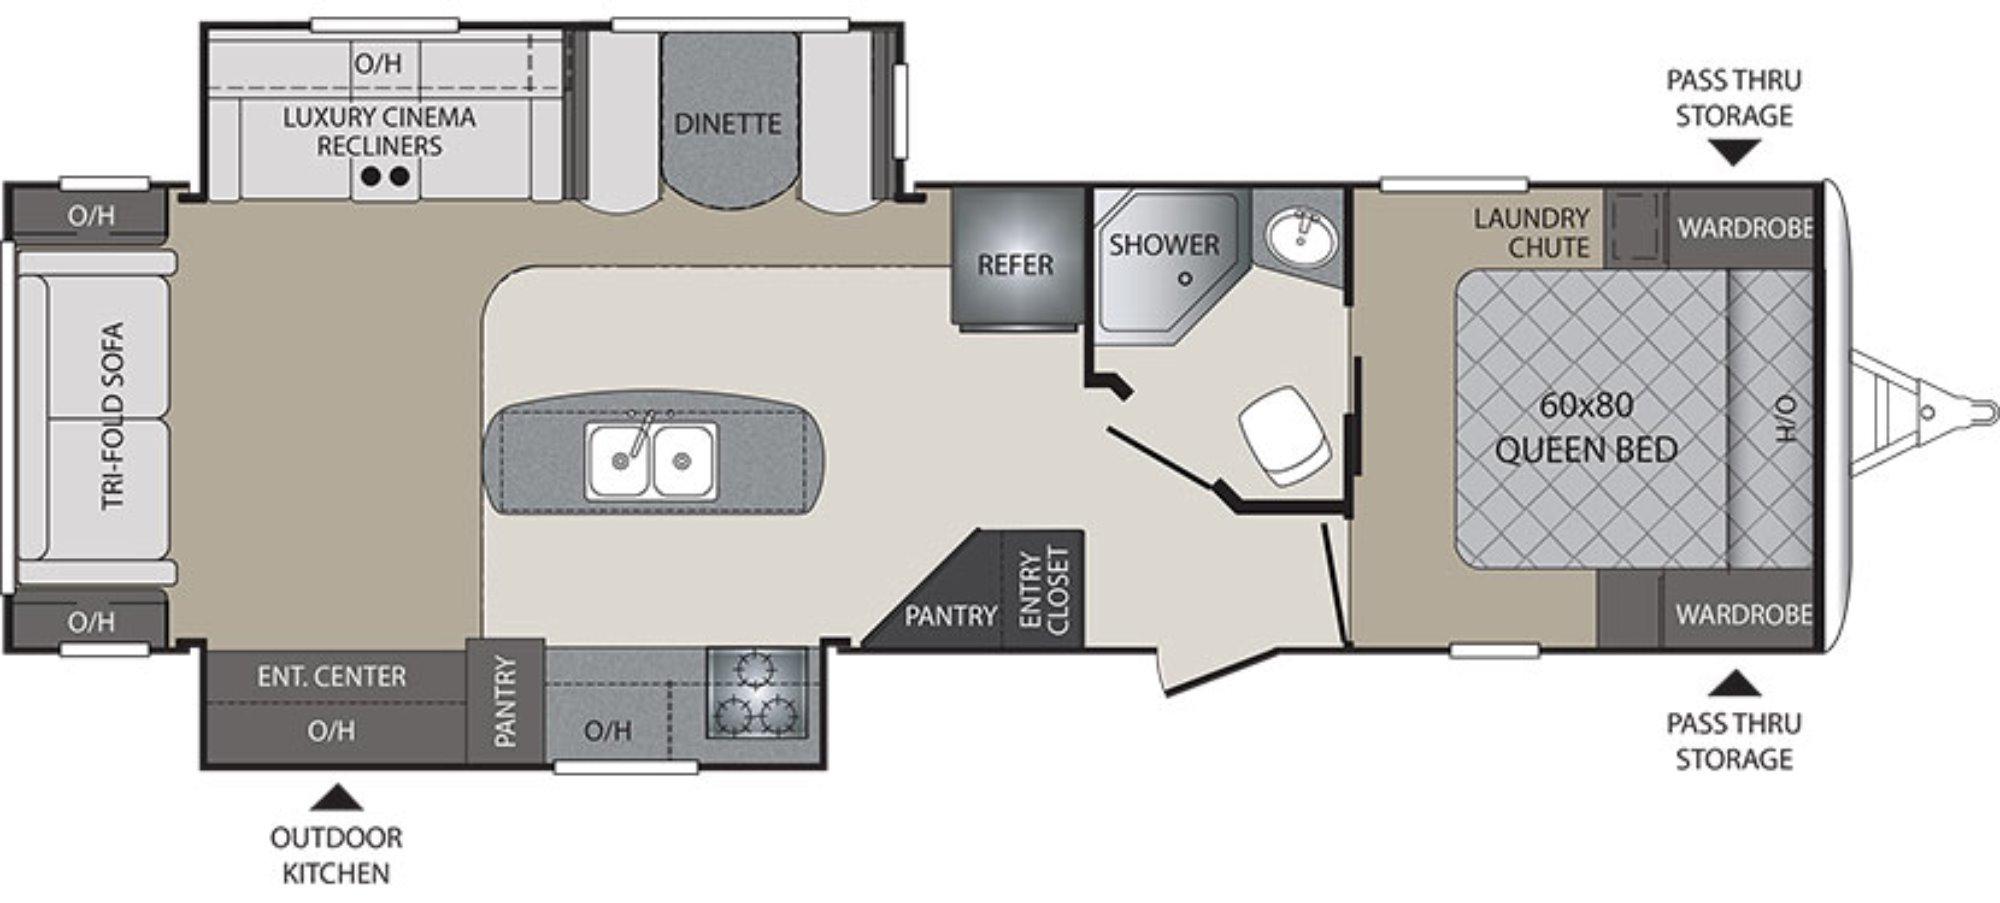 View Floor Plan for 2016 KEYSTONE PREMIER 30RI